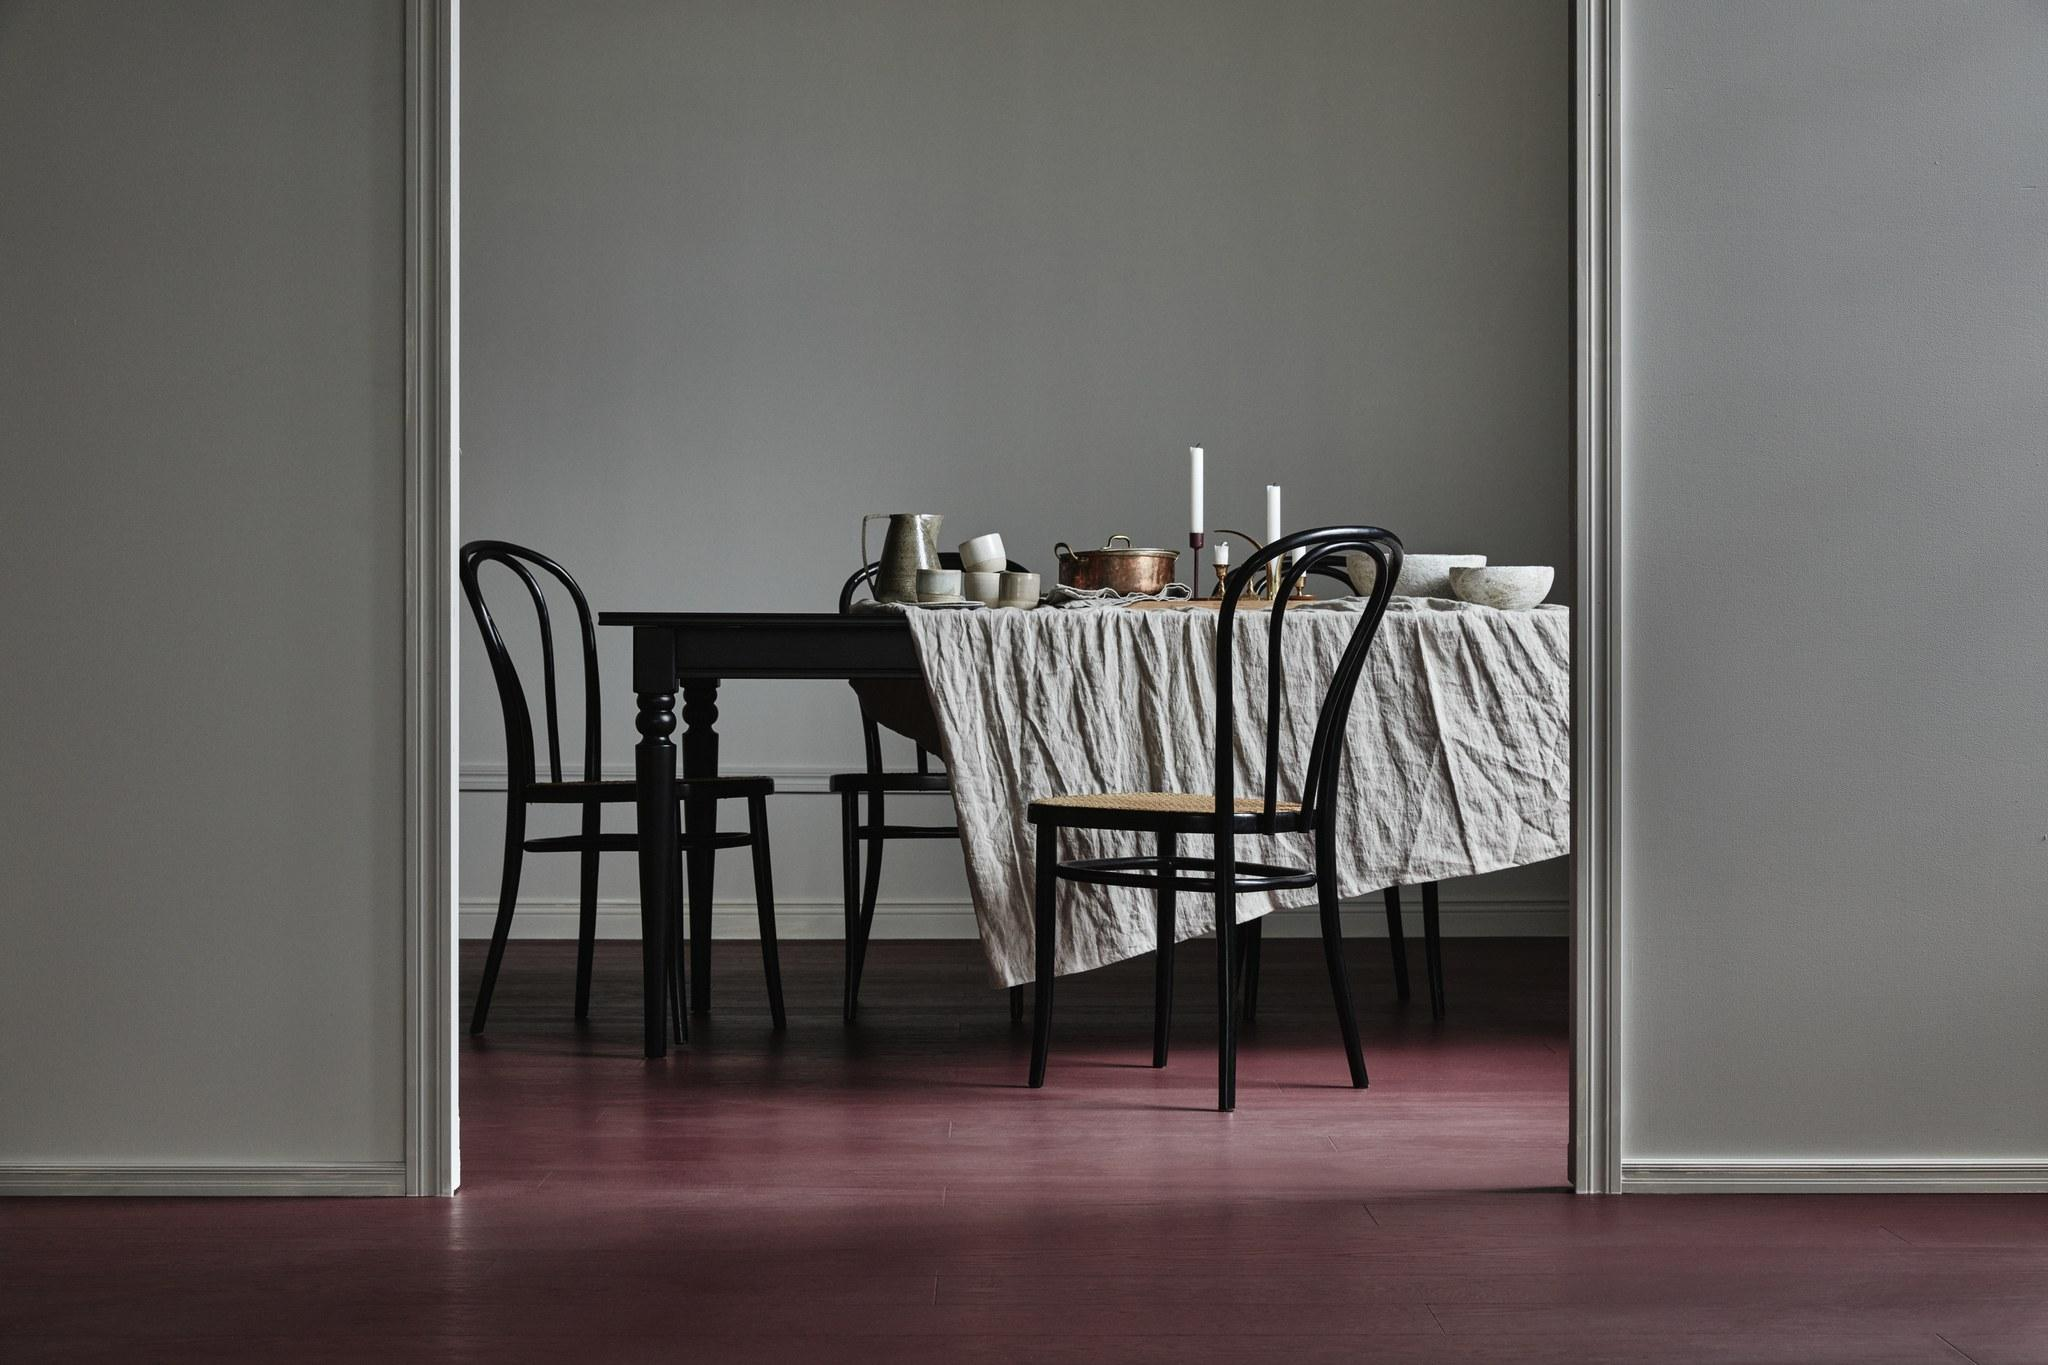 Timberwise-tammi-oak-burgundy-harjattu-brush-mattalakattu-matte lacquer-vaaka